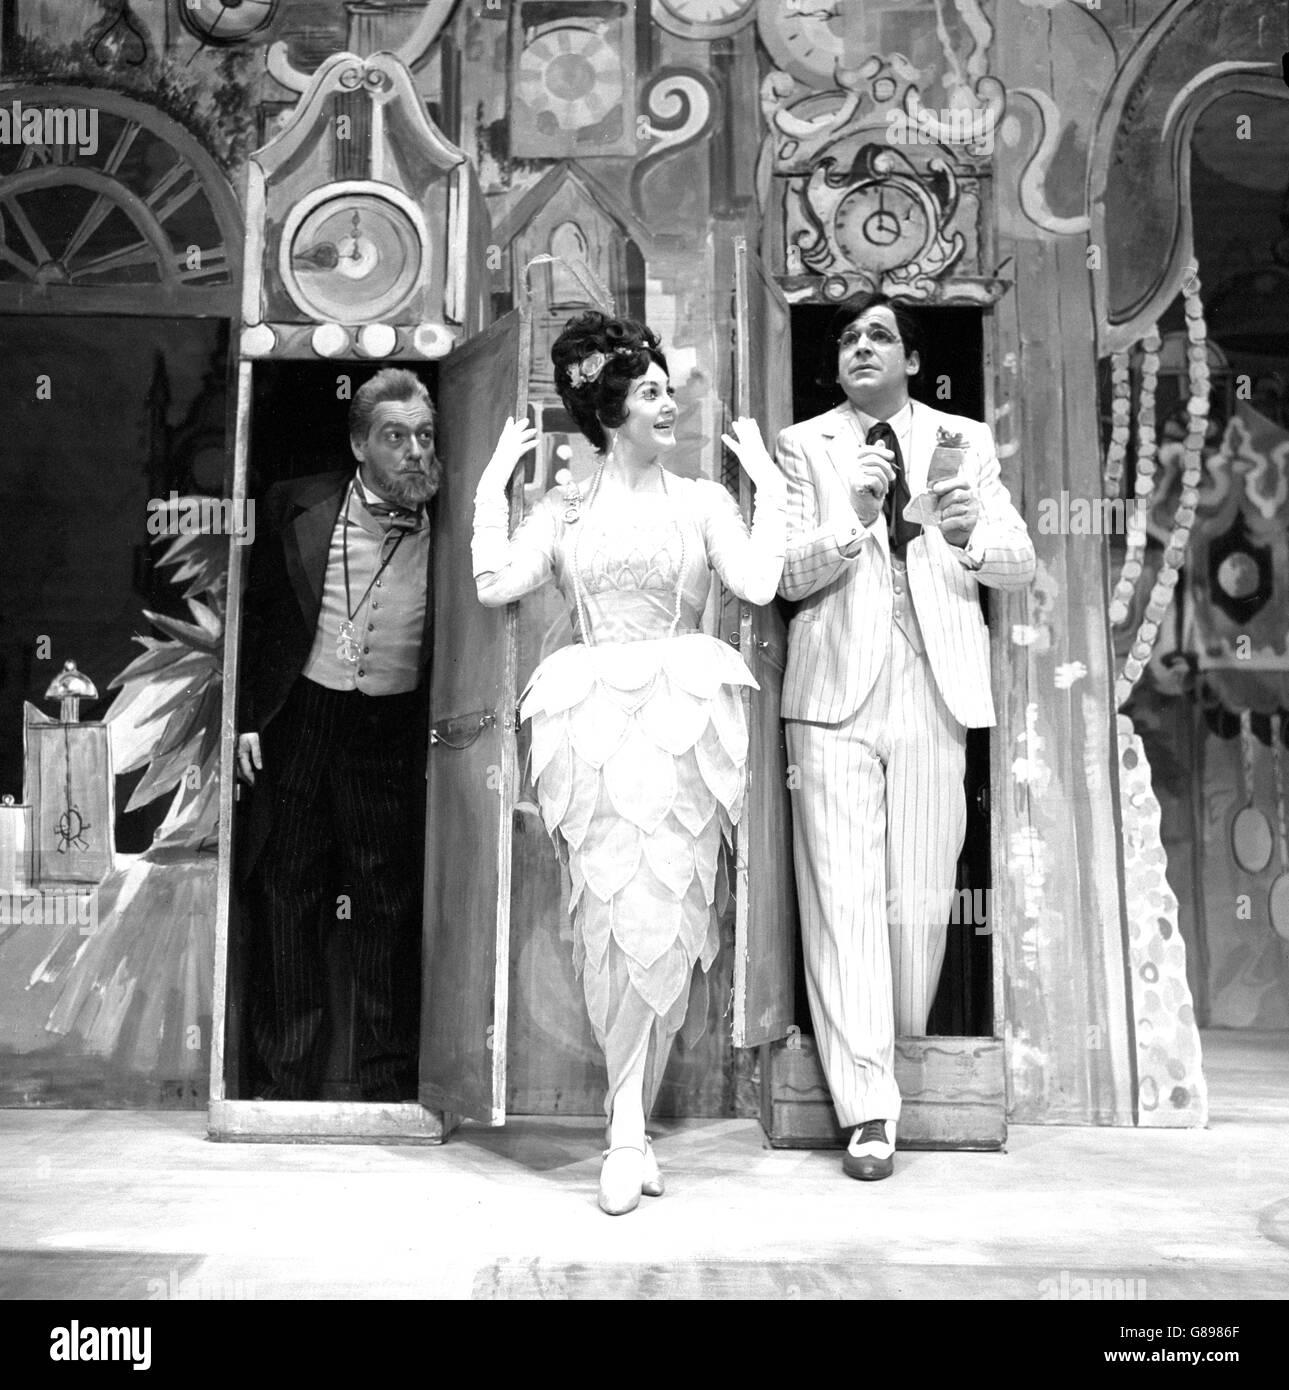 Theatre - L'Heure Espagnole - Sadler's Wells, London - Stock Image